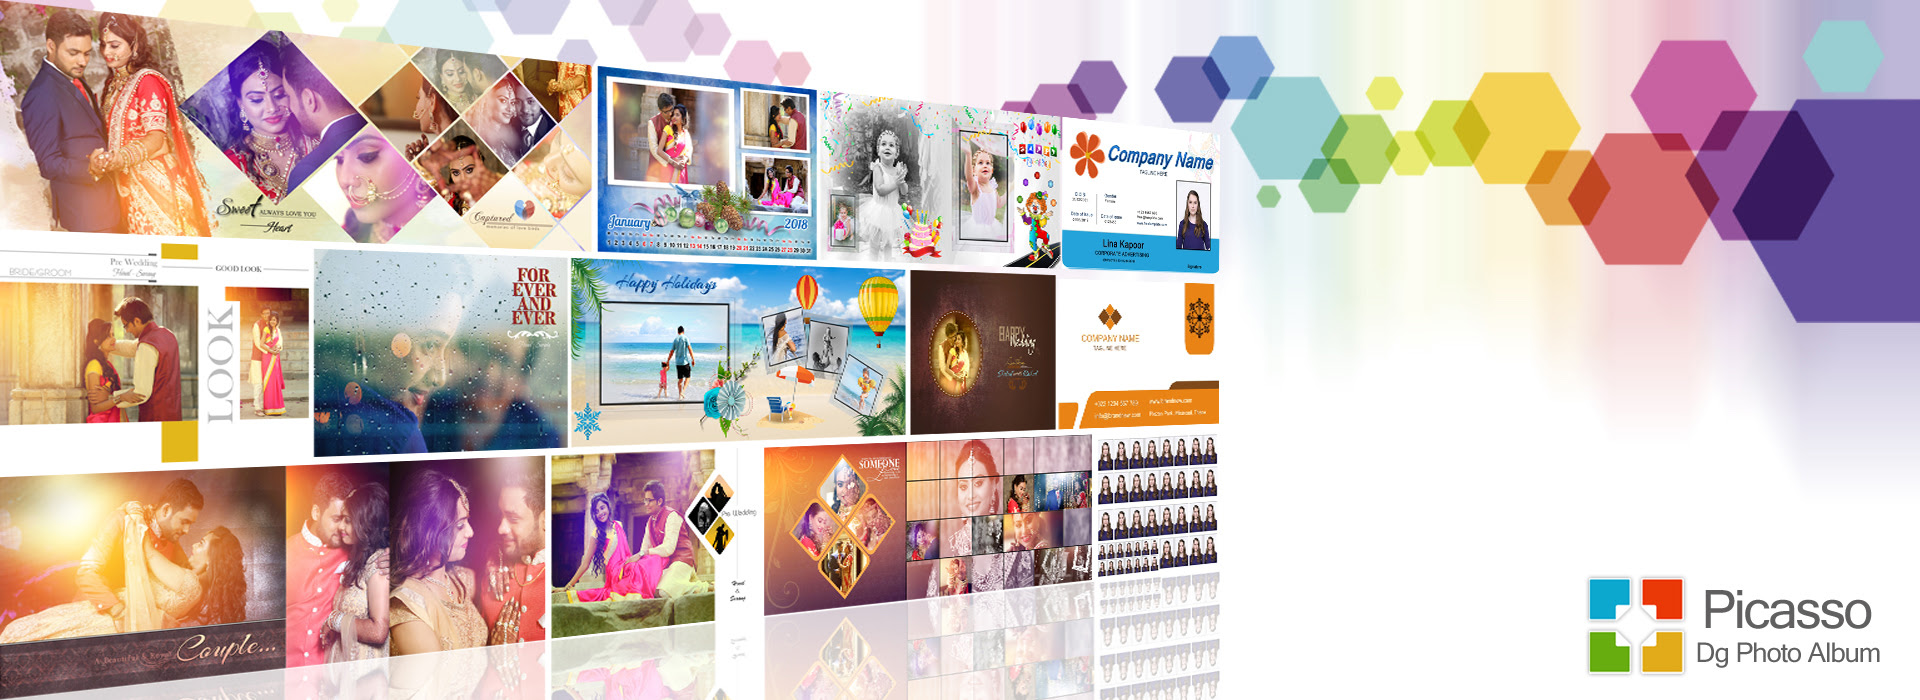 picasso dg photo album software free download